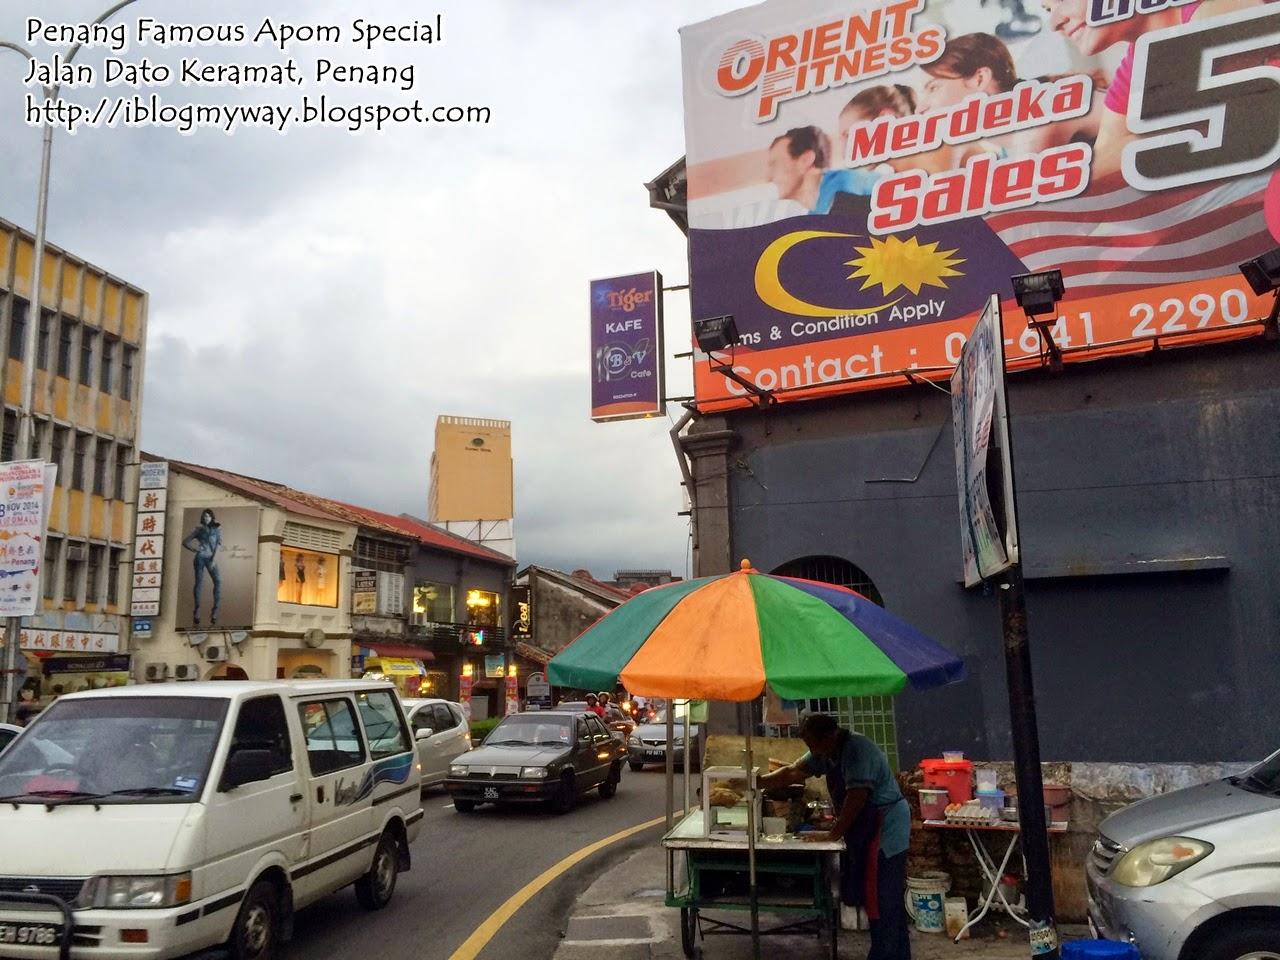 Penang famous apom